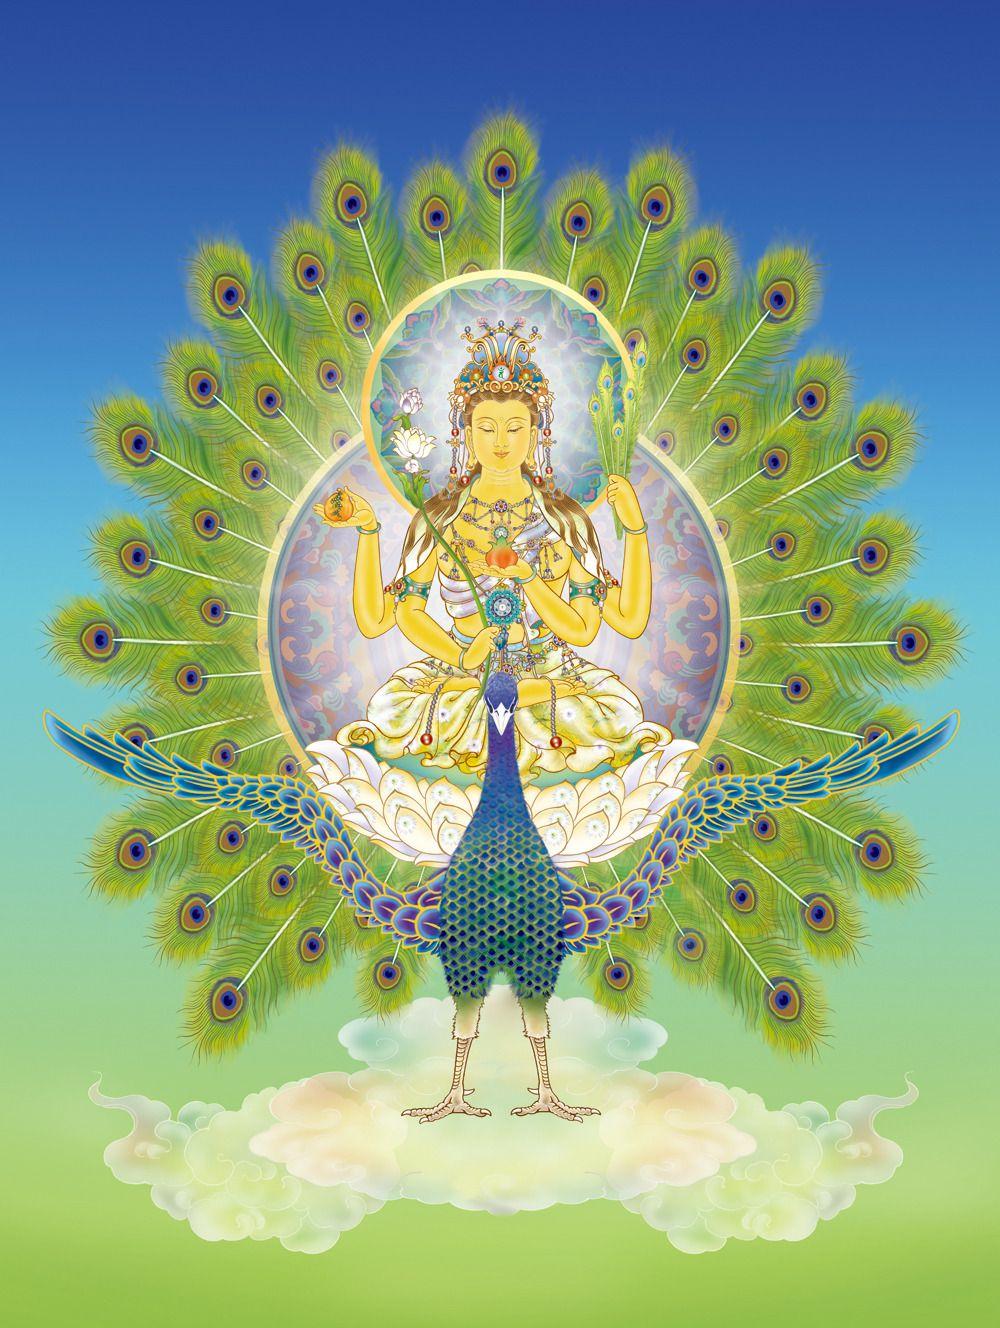 Mahamayuri, also called Mahamayuir Vidya-rajni, is a peaceful goddess of  wisdom (similar to Saraswati in Hinduism) | Buddhist art, Wiccan art, Art